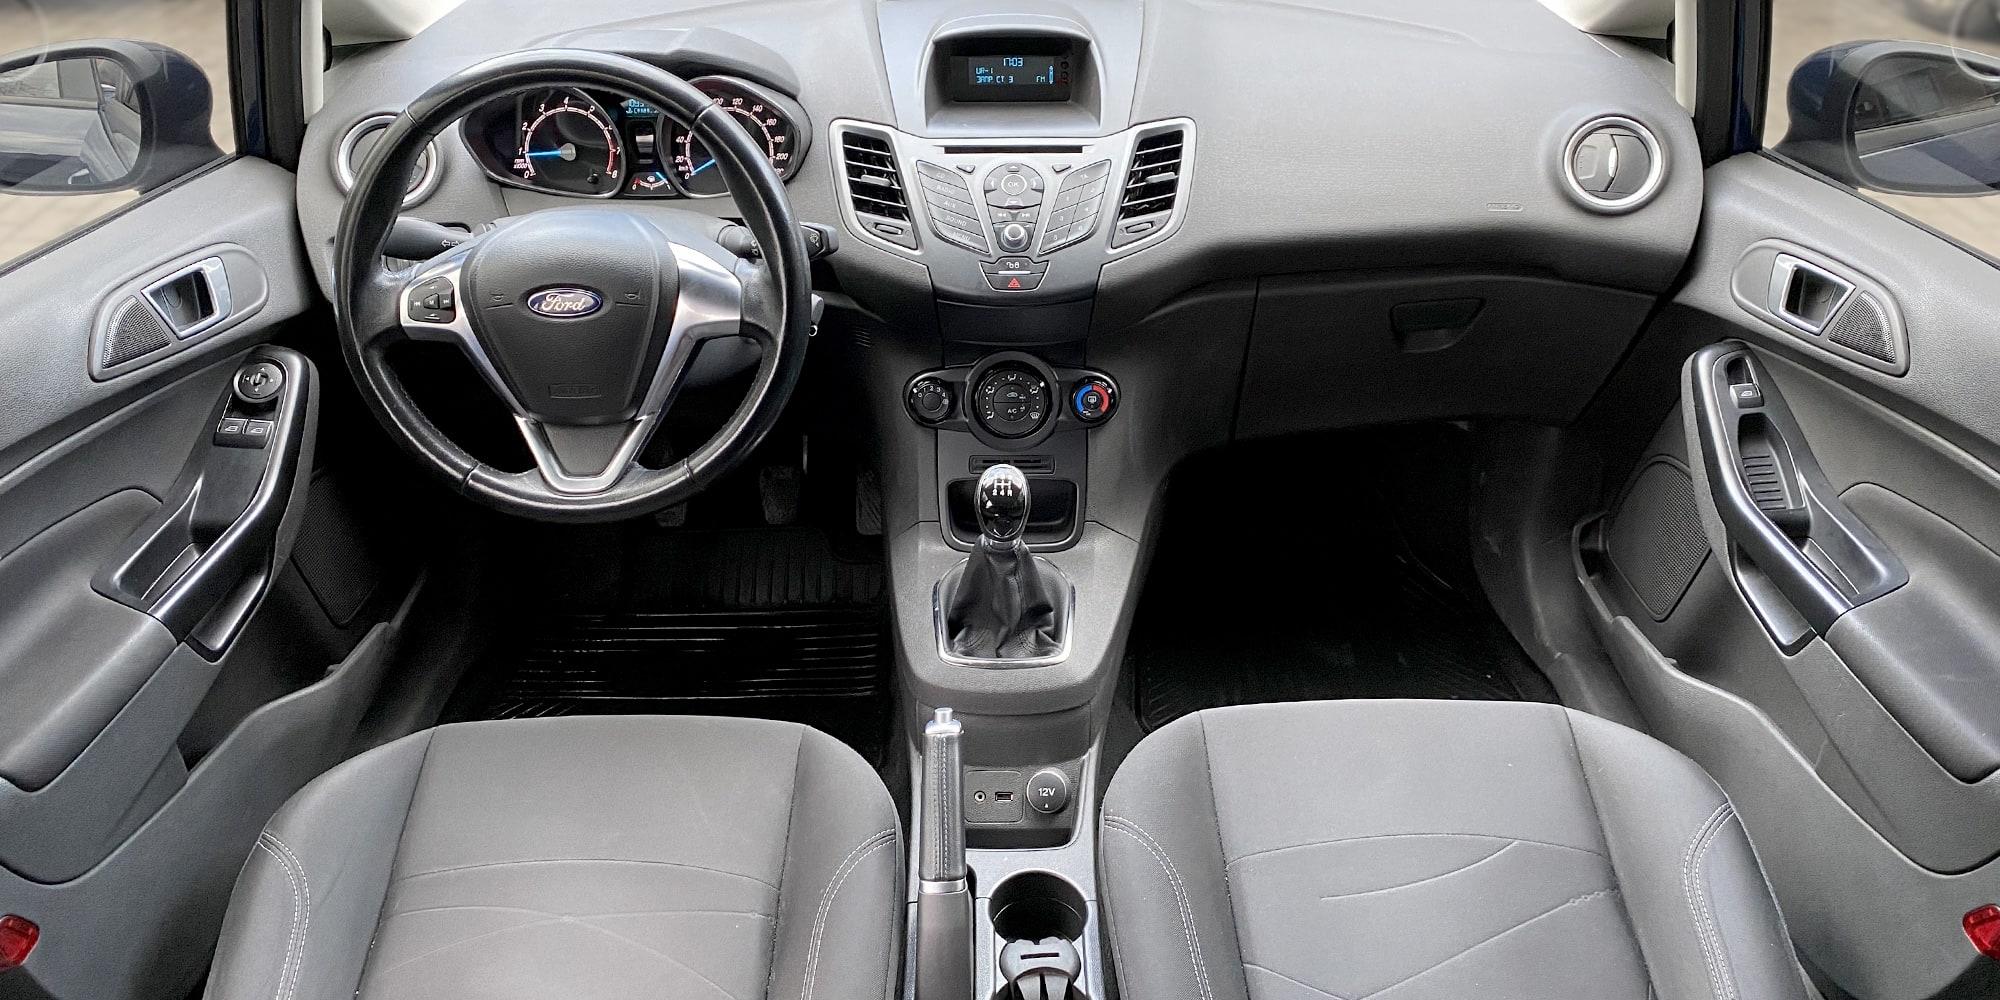 Ford Fiesta manual - TopRent: Служба аренды авто в Киеве